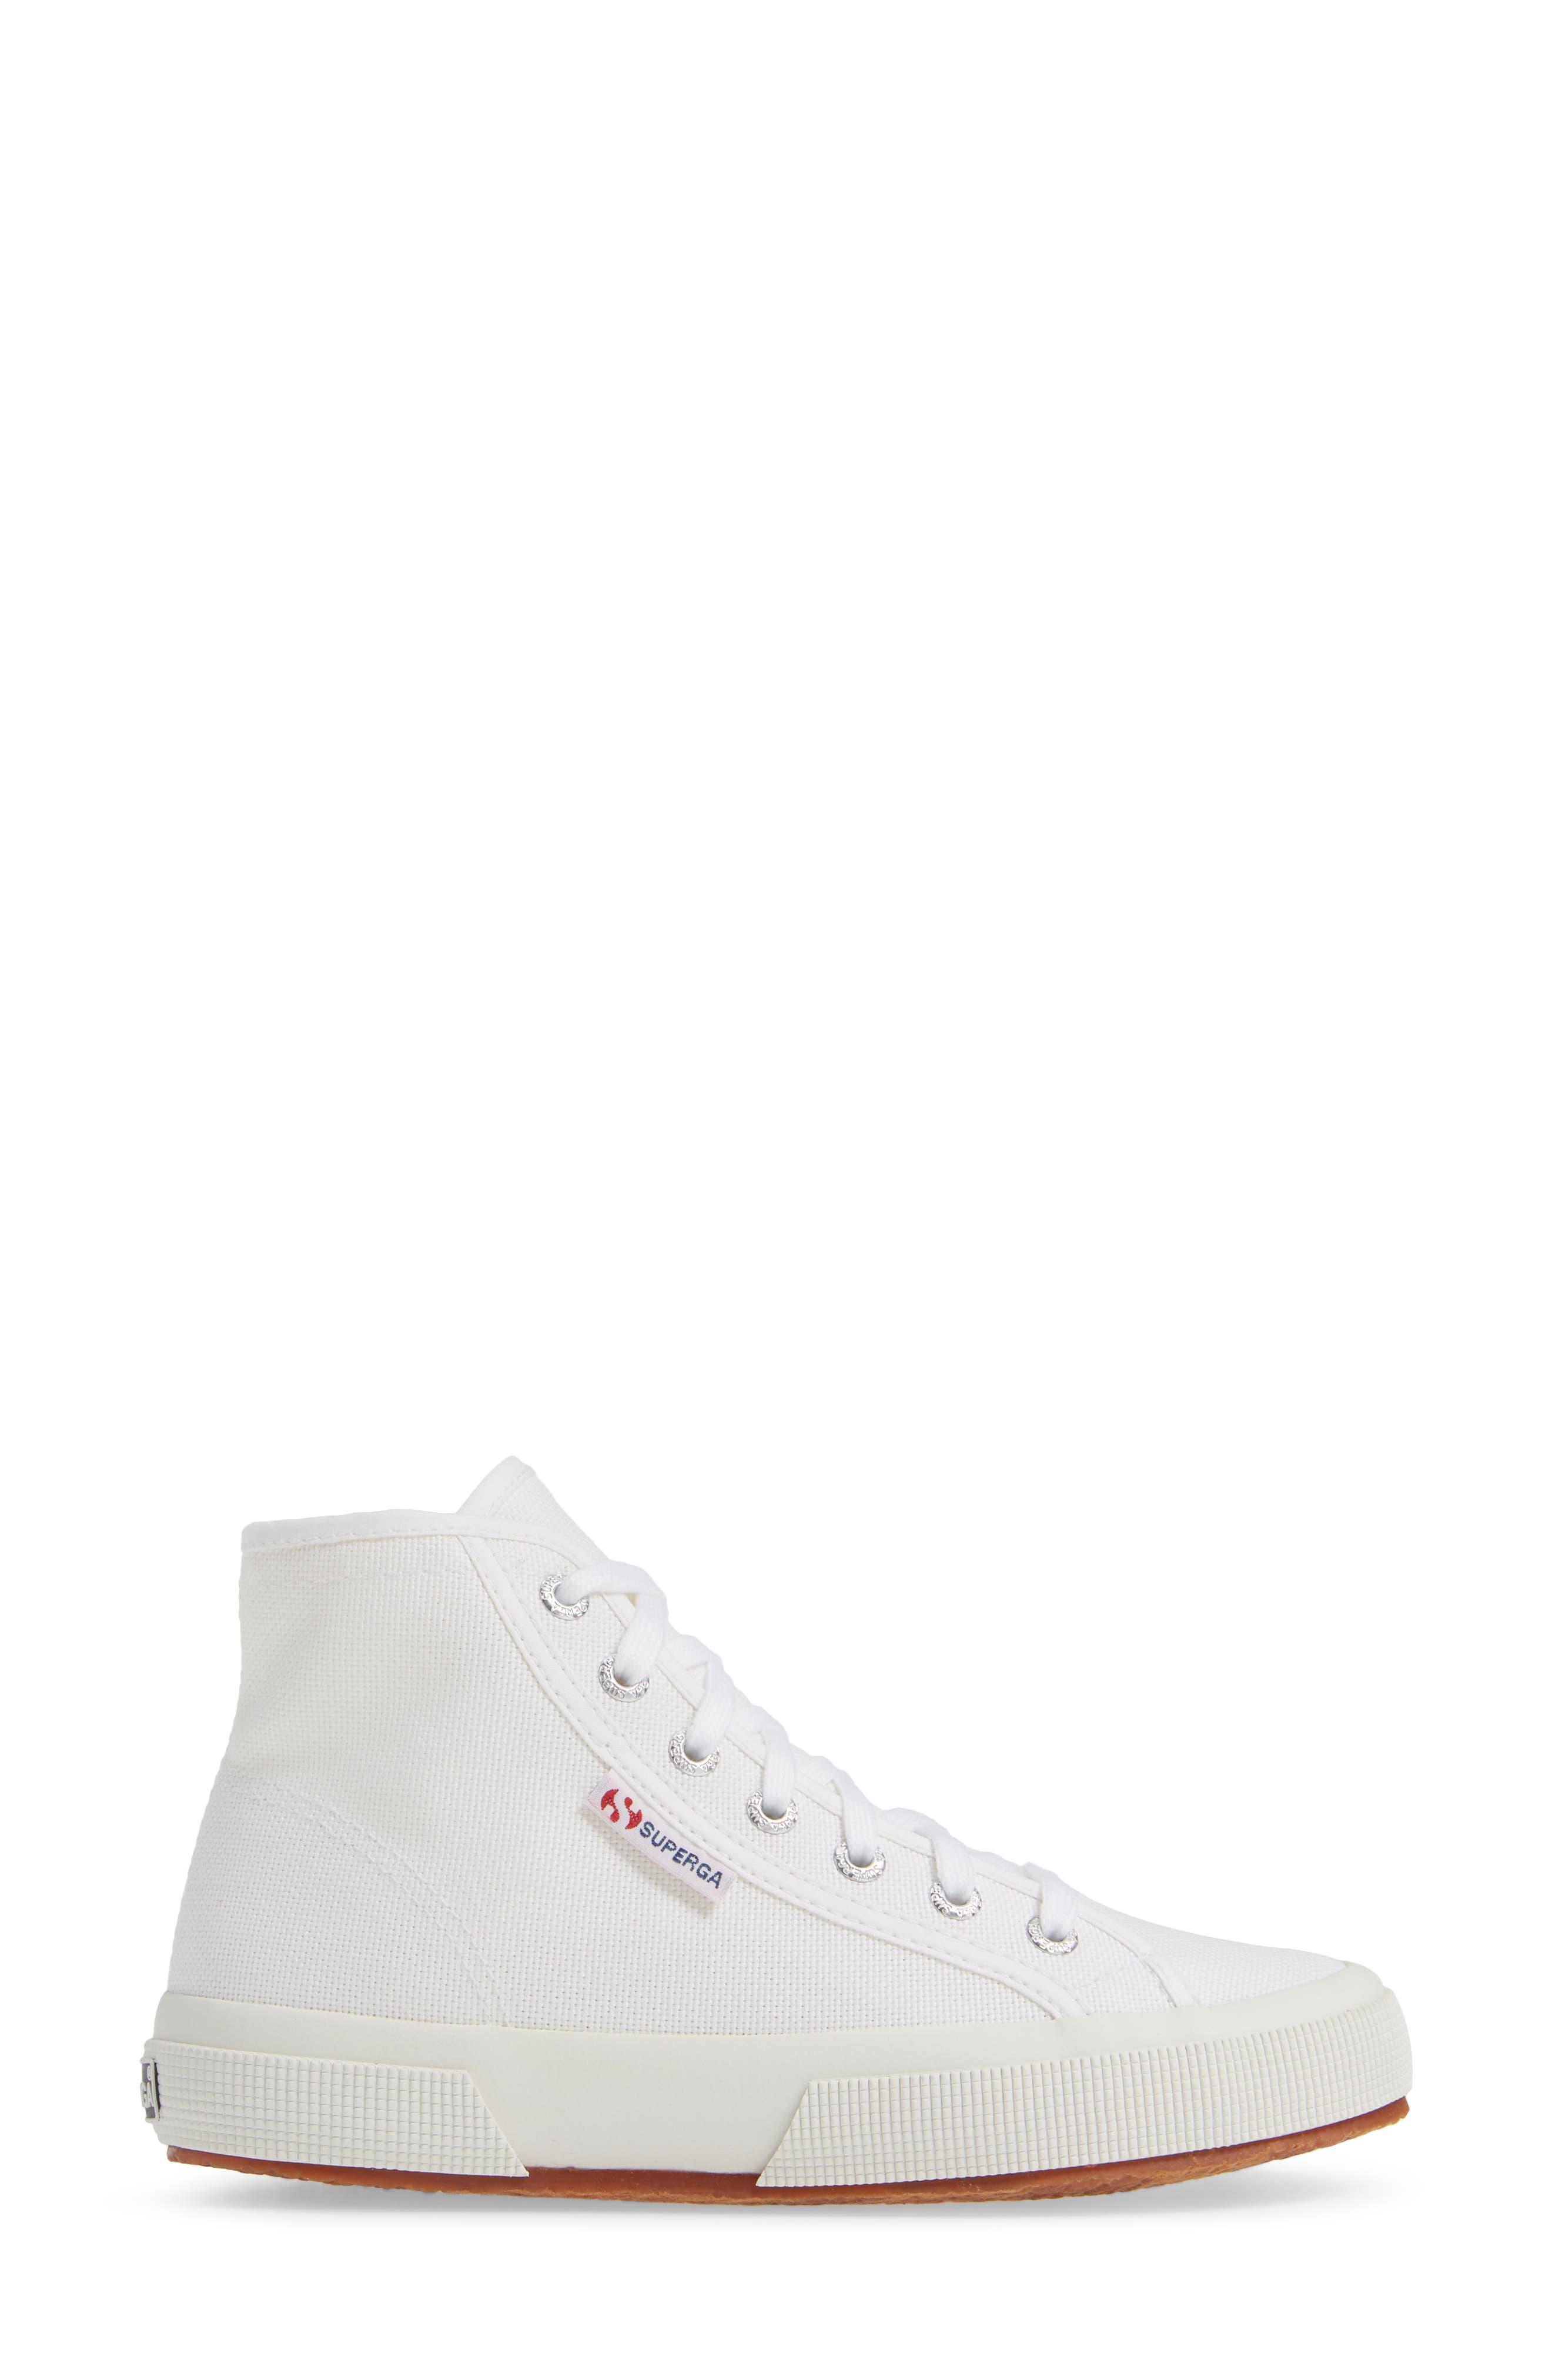 2795 High Top Sneaker,                             Alternate thumbnail 3, color,                             WHITE